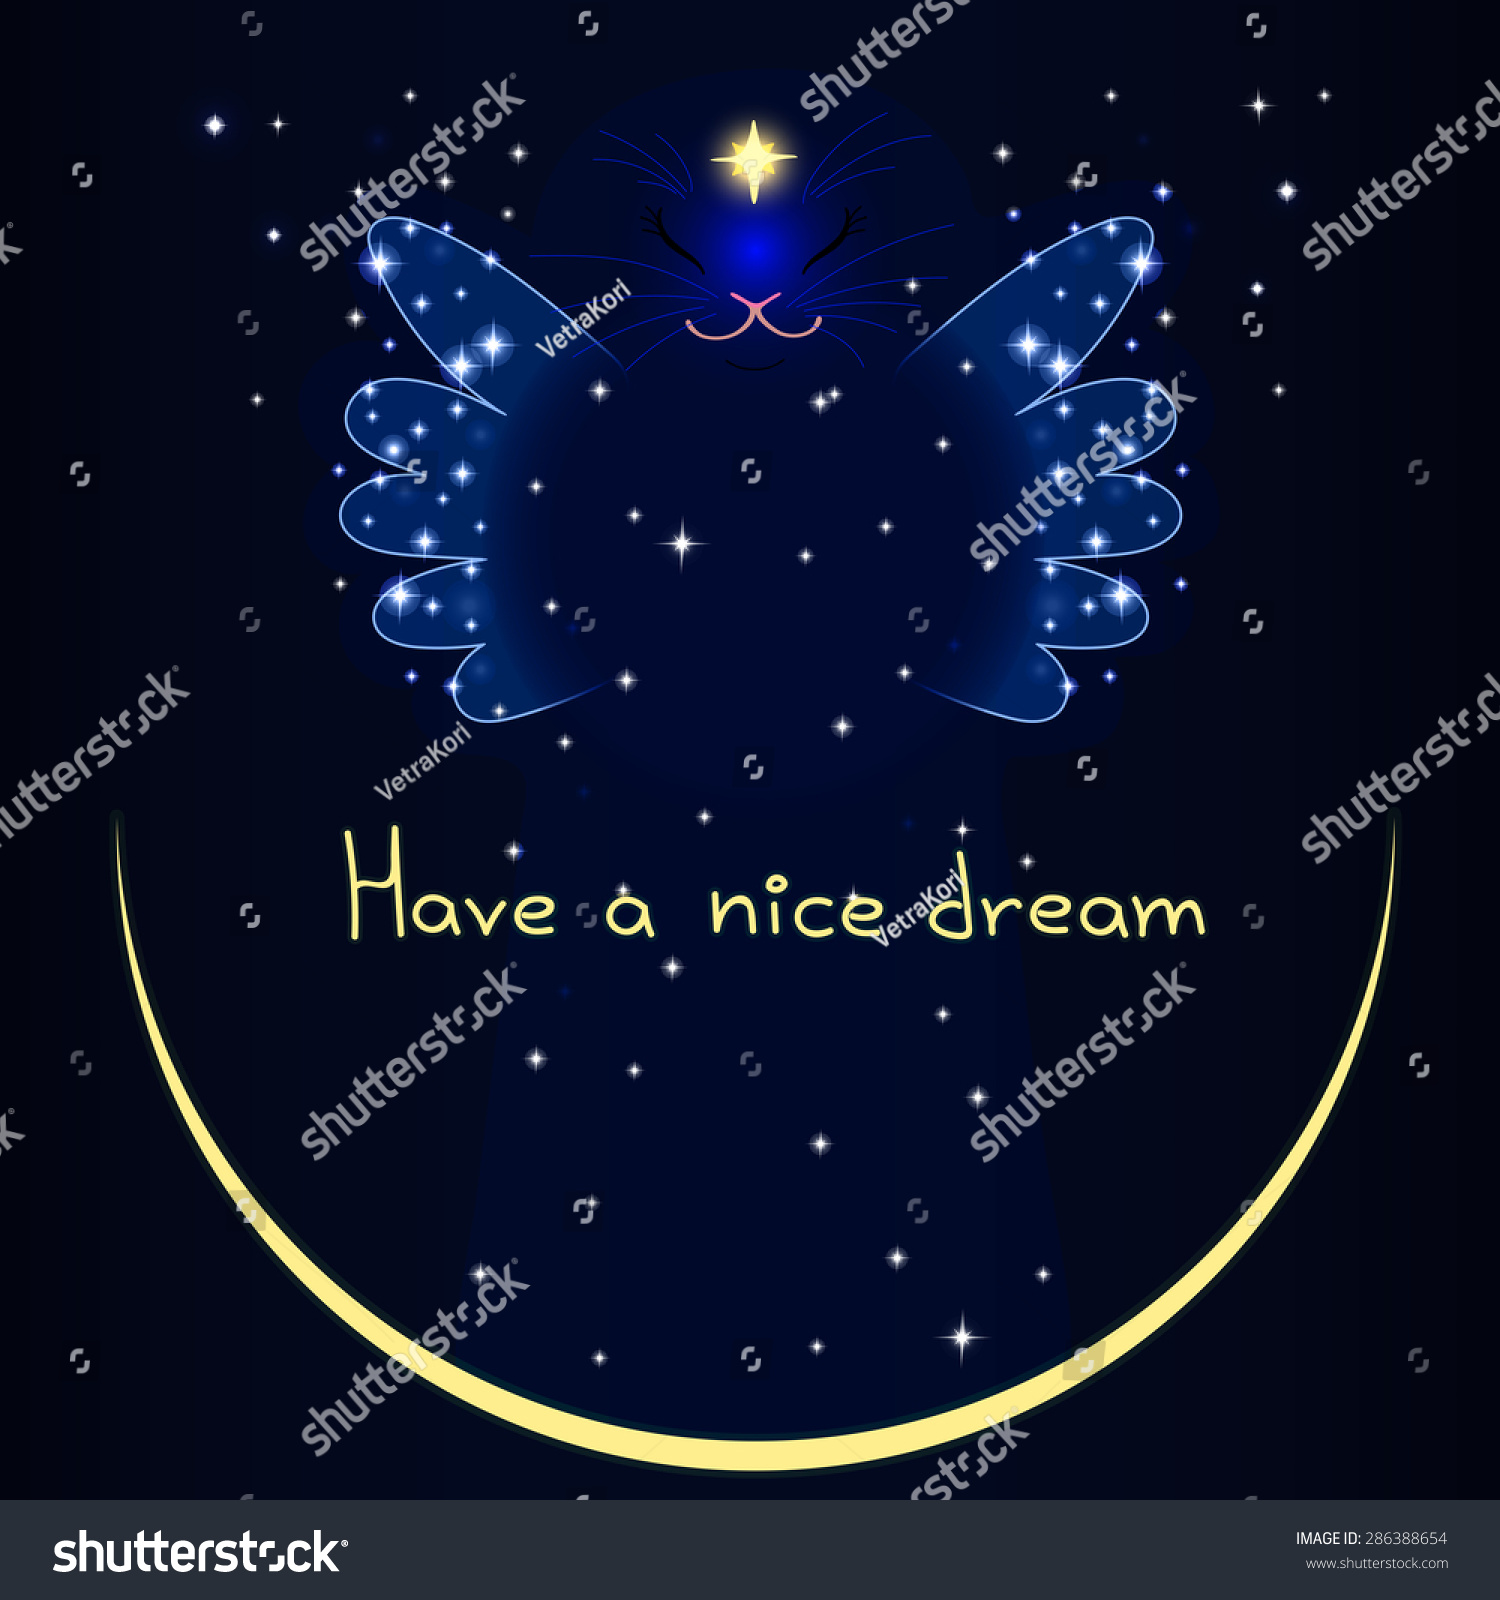 Cat night fairy have nice dream stock vector 286388654 shutterstock cat night fairy have a nice dream buycottarizona Gallery